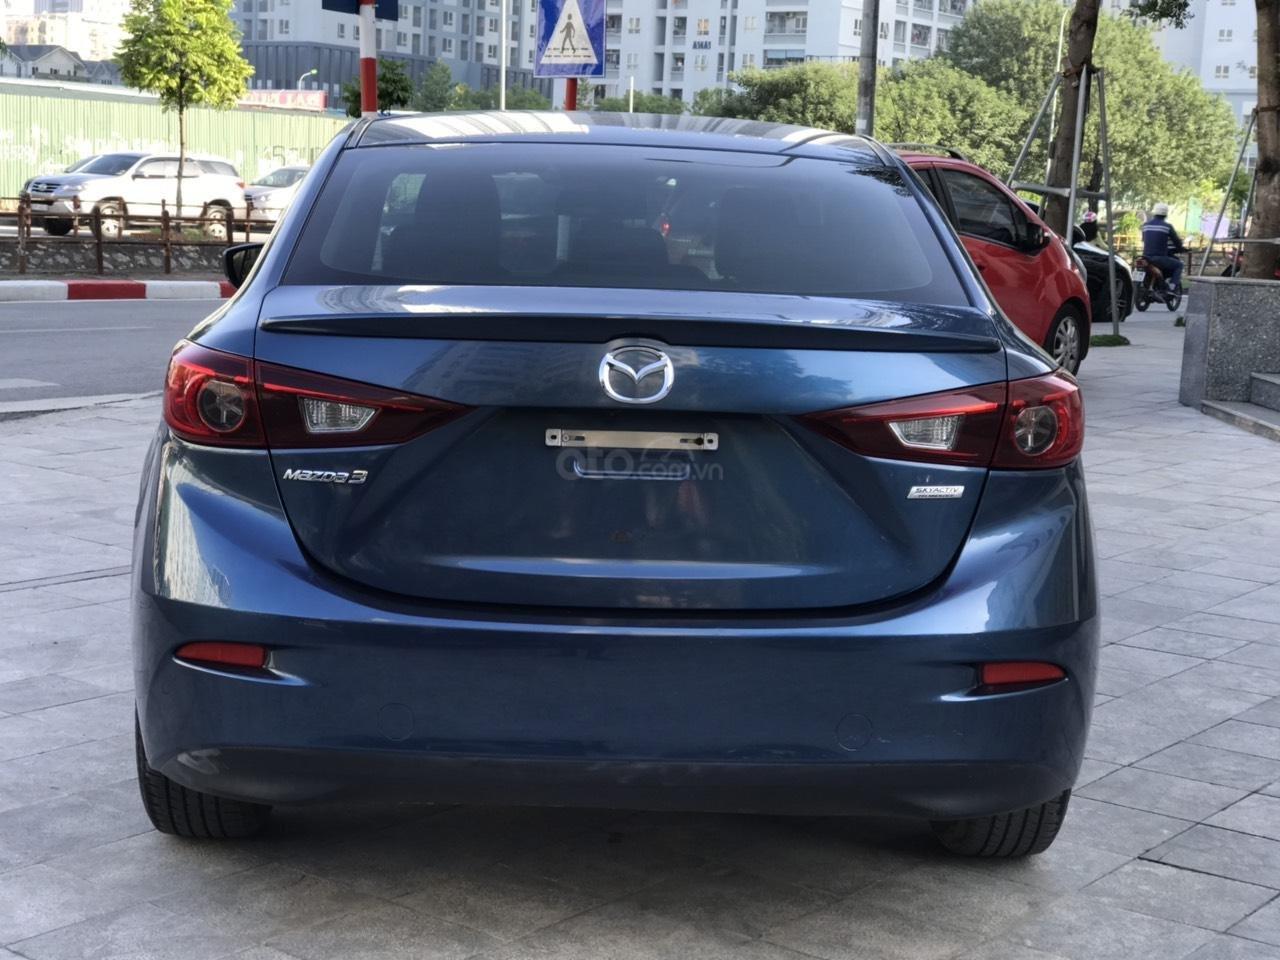 ManyCar bán Mazda 3 sedan model 2018, xe đẹp đi ít (11)